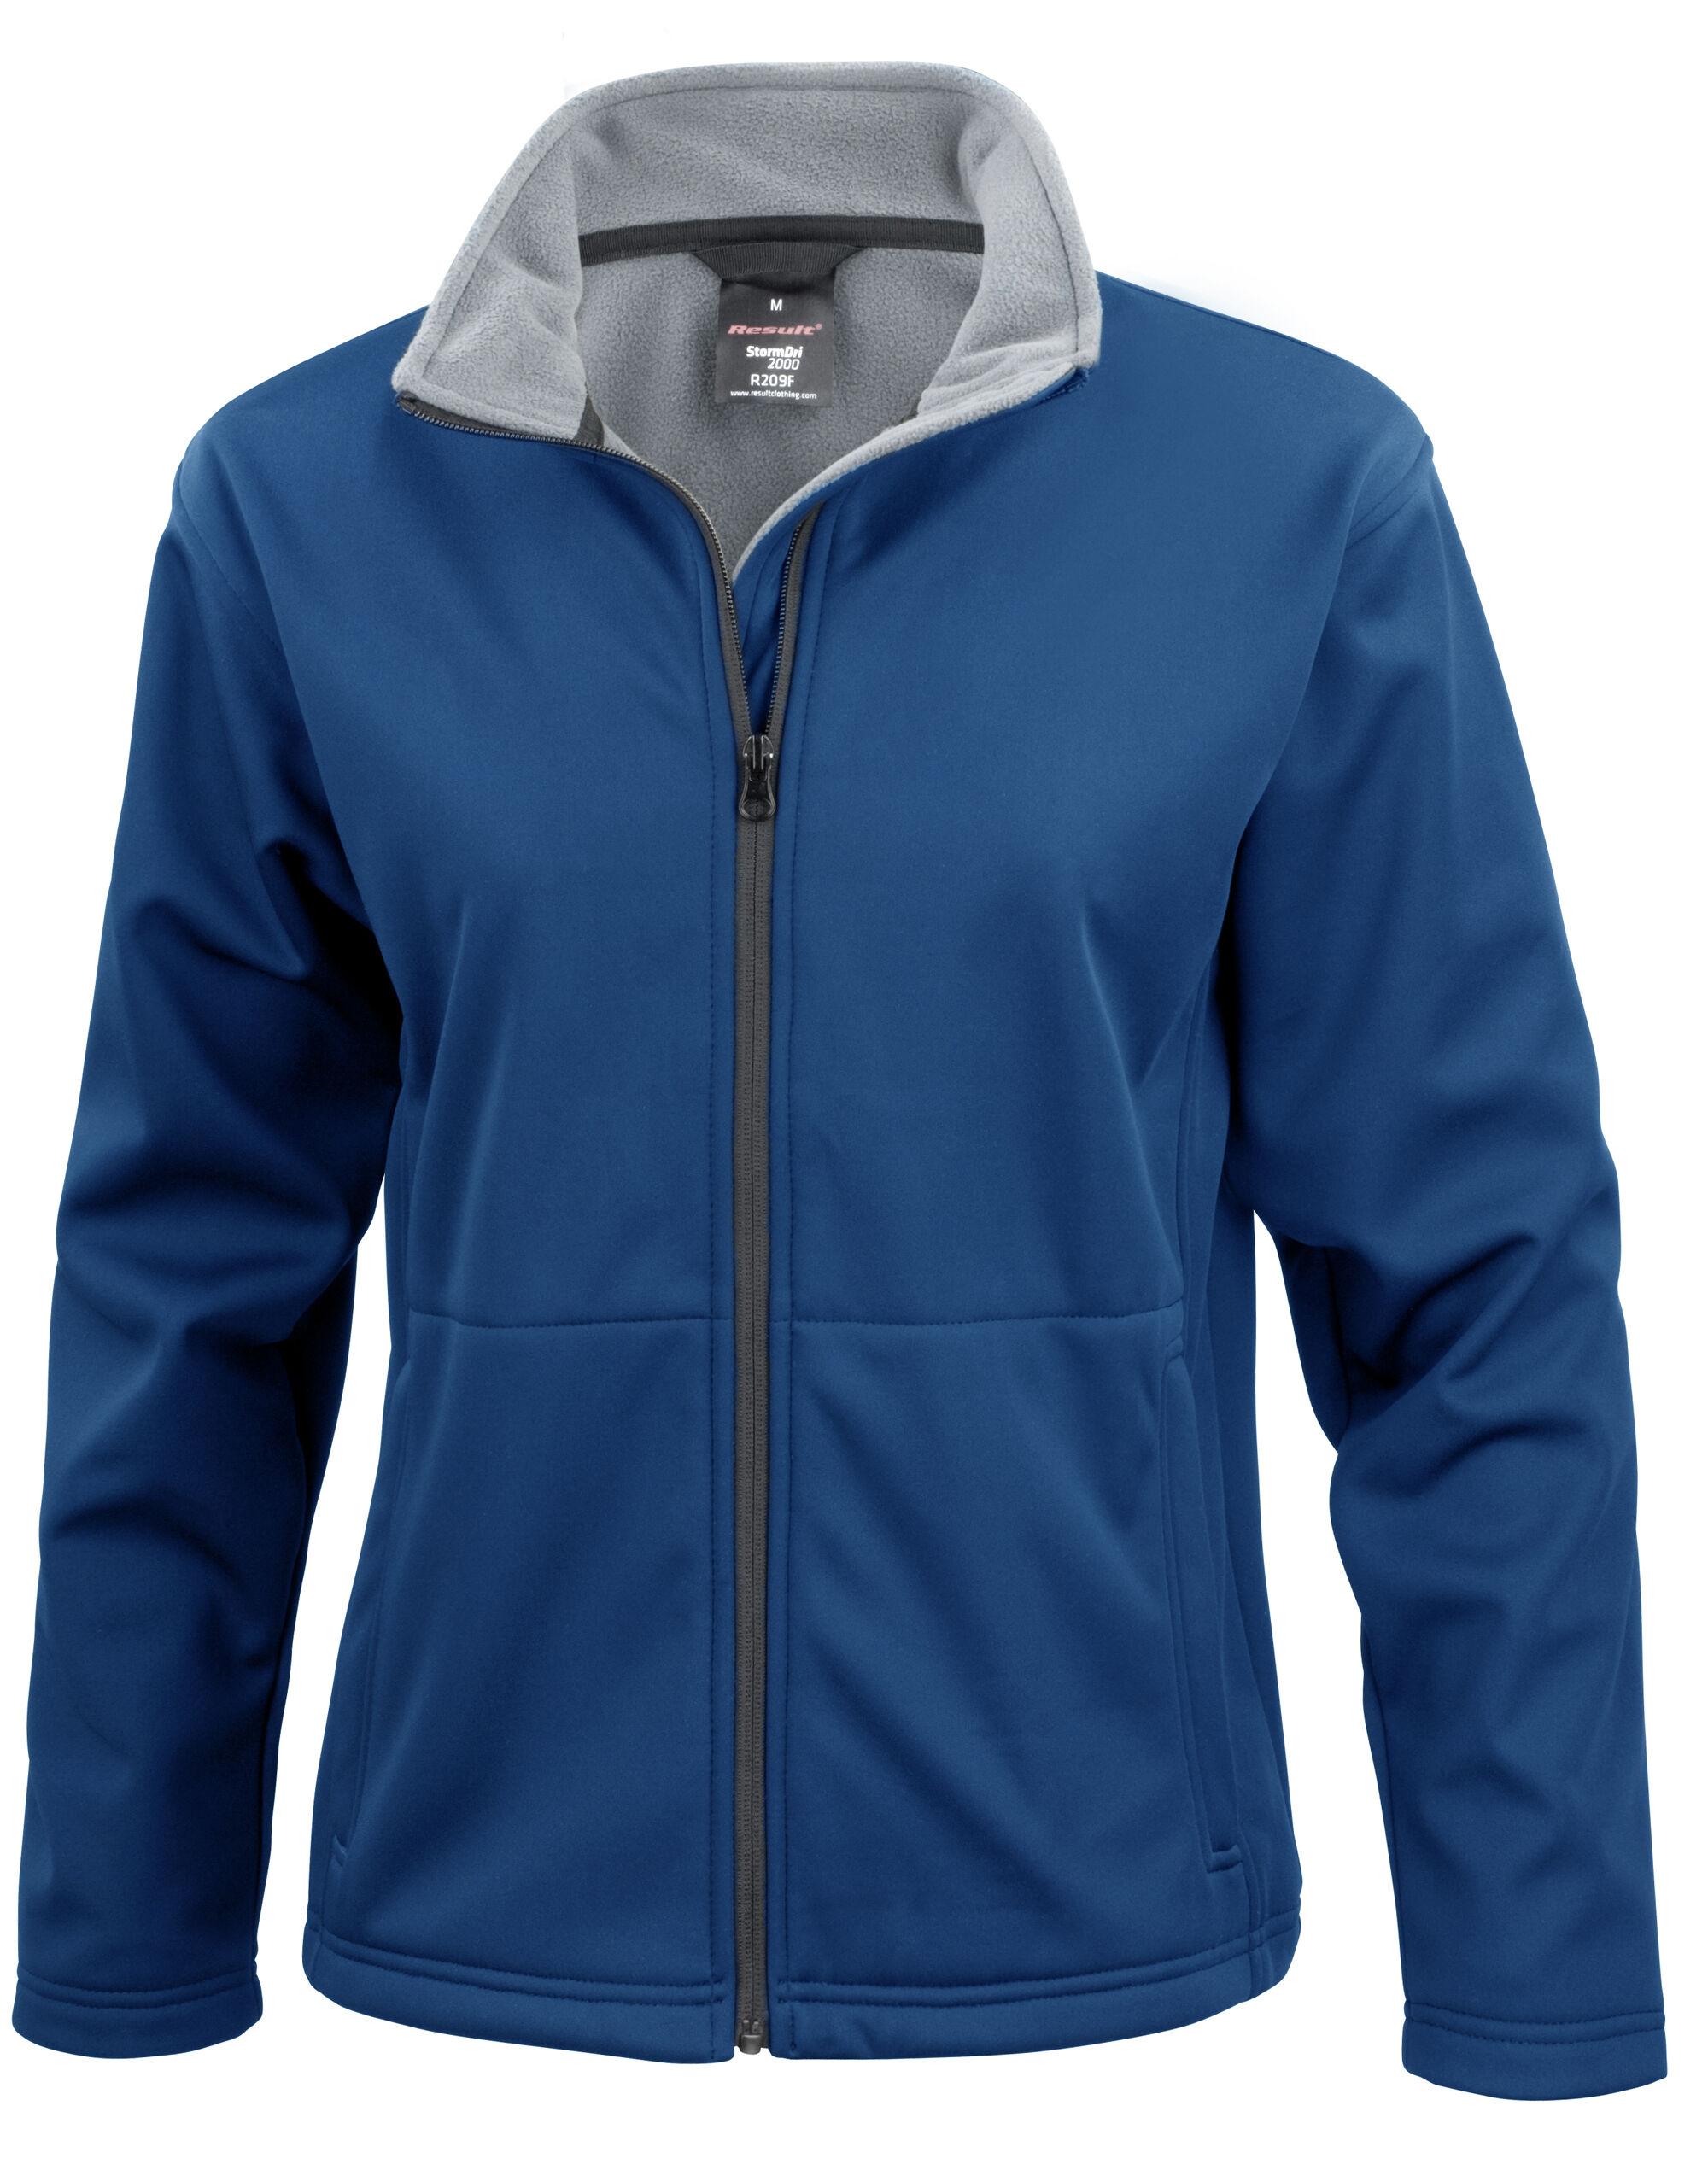 Core Ladies' Soft Shell Jacket